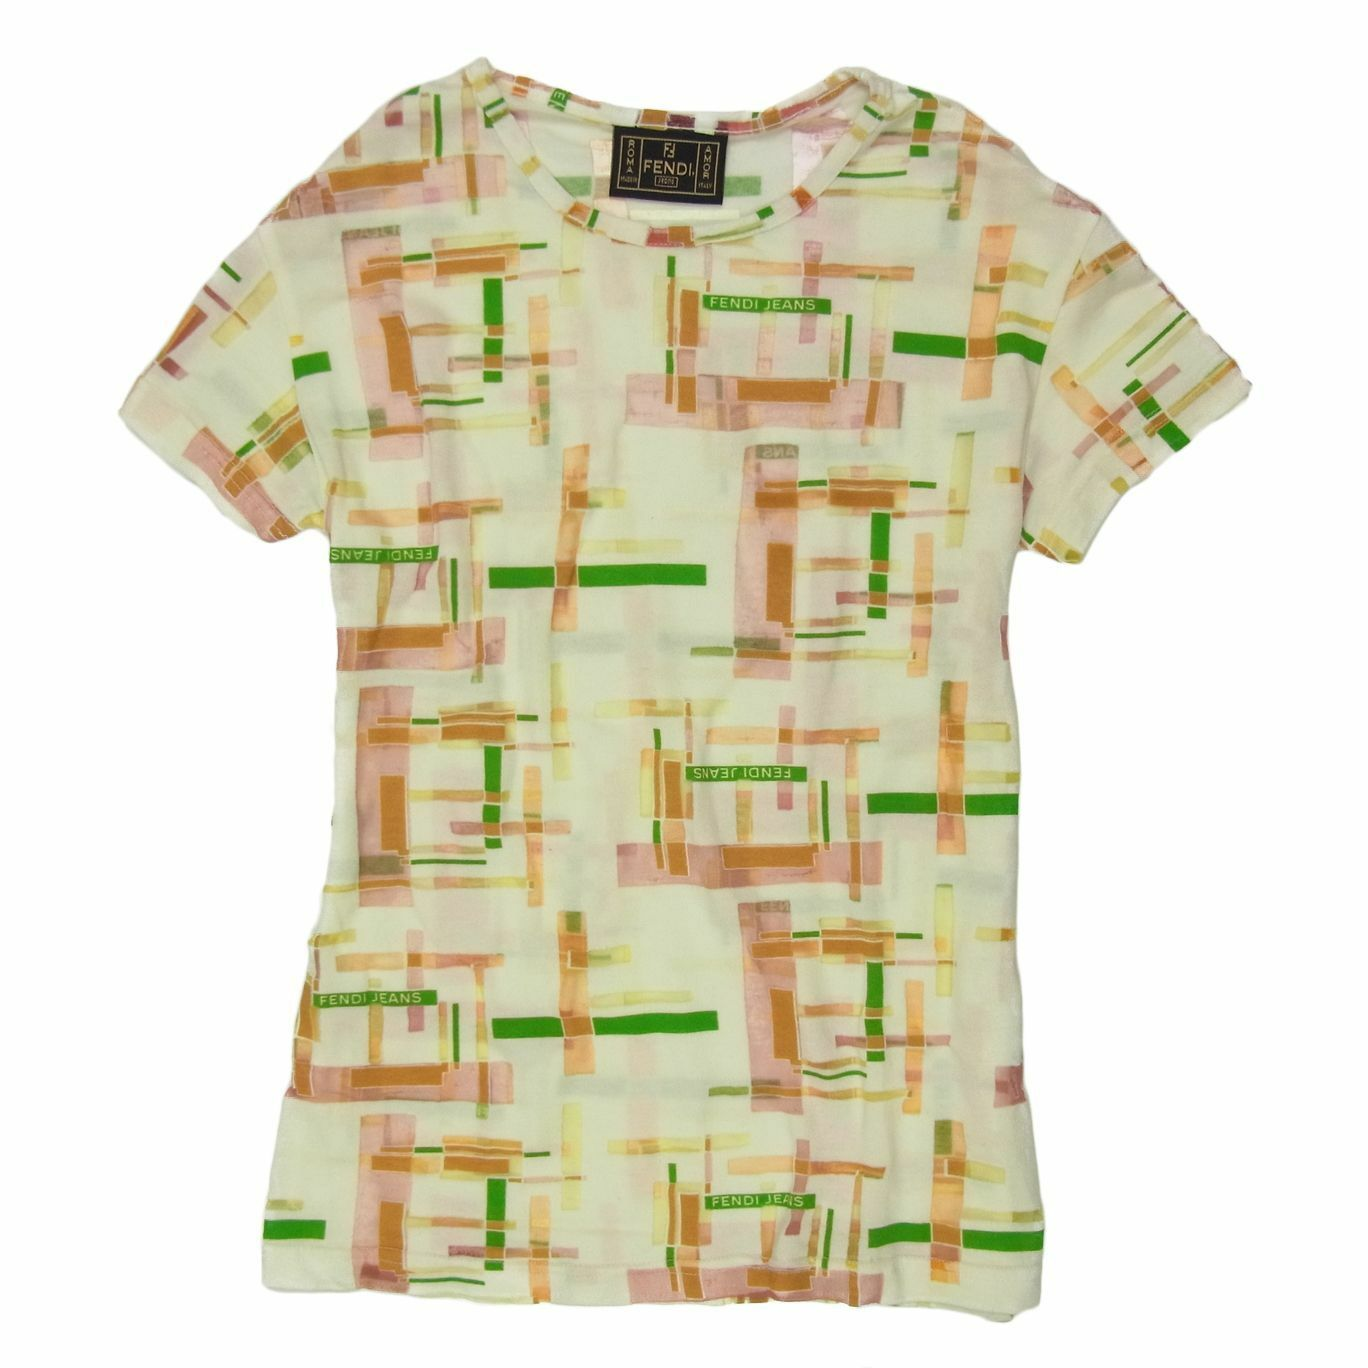 Auth FENDI Jeans Logos Stretchable T Shirt Tops Sz 40 US M F S 1647